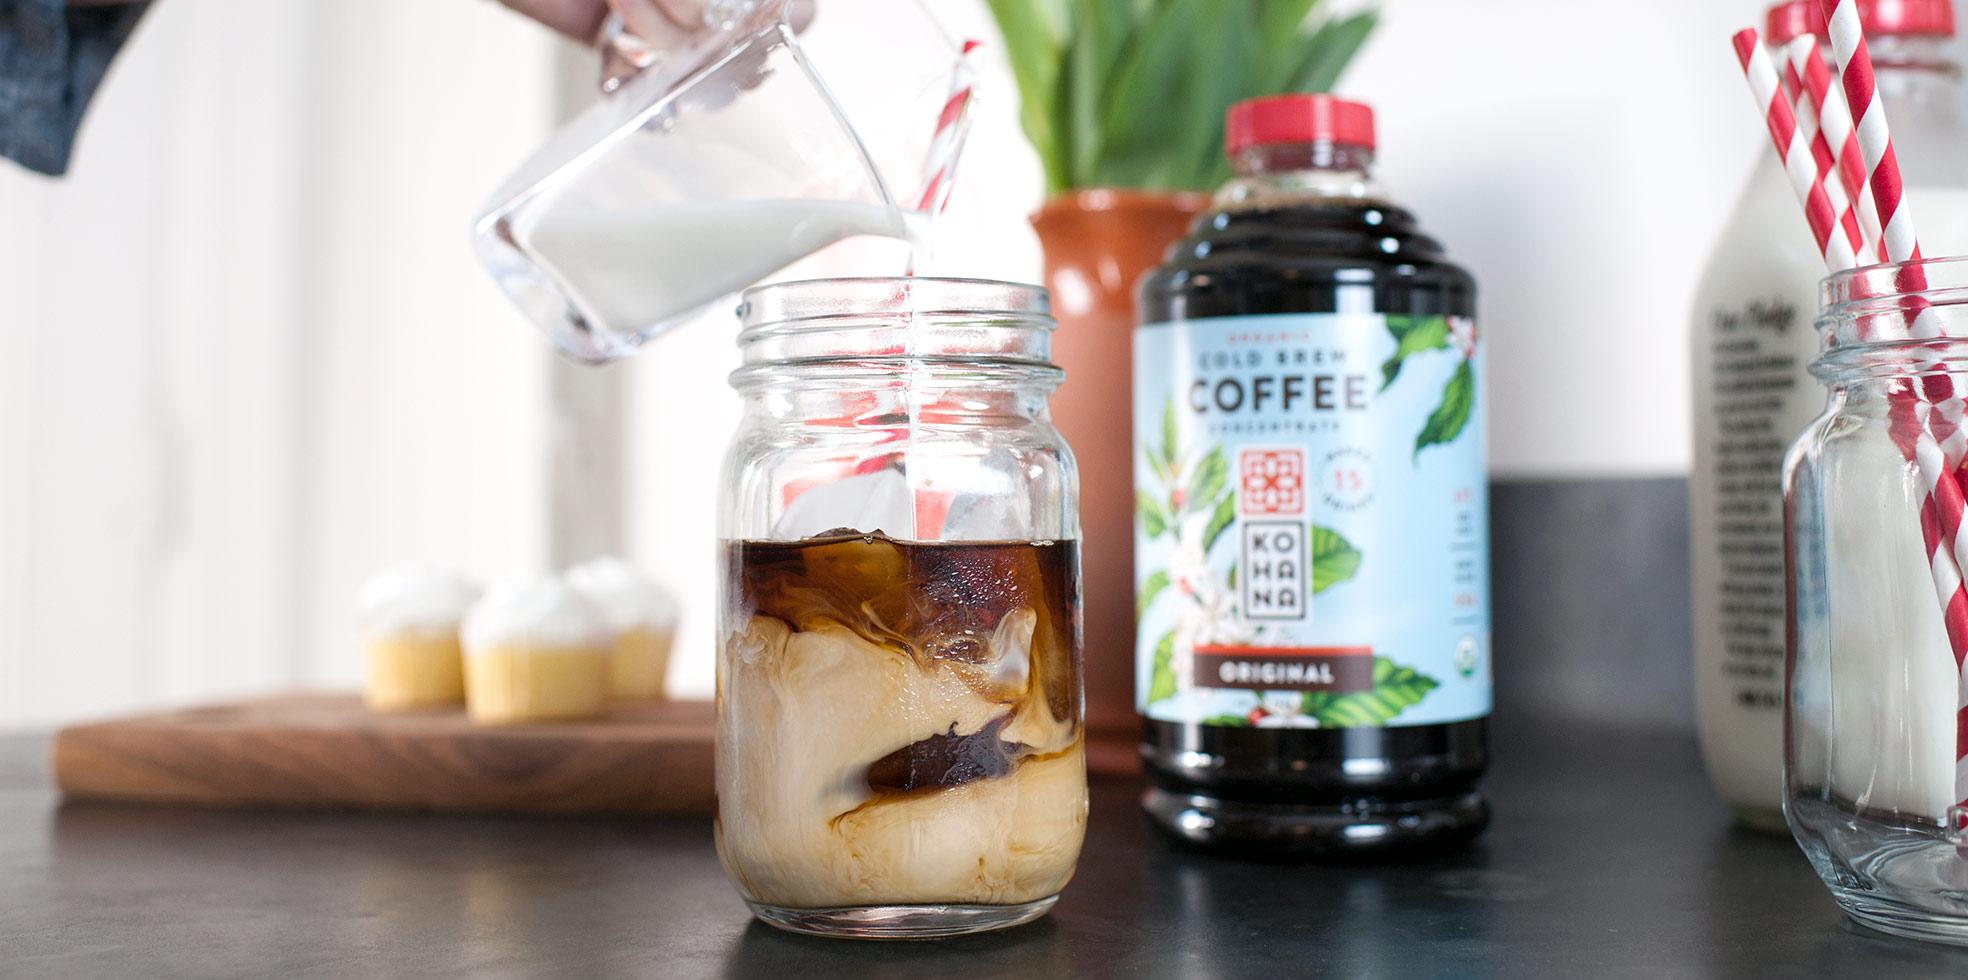 Kohana Cold Brew Coffee Gerhards Canada